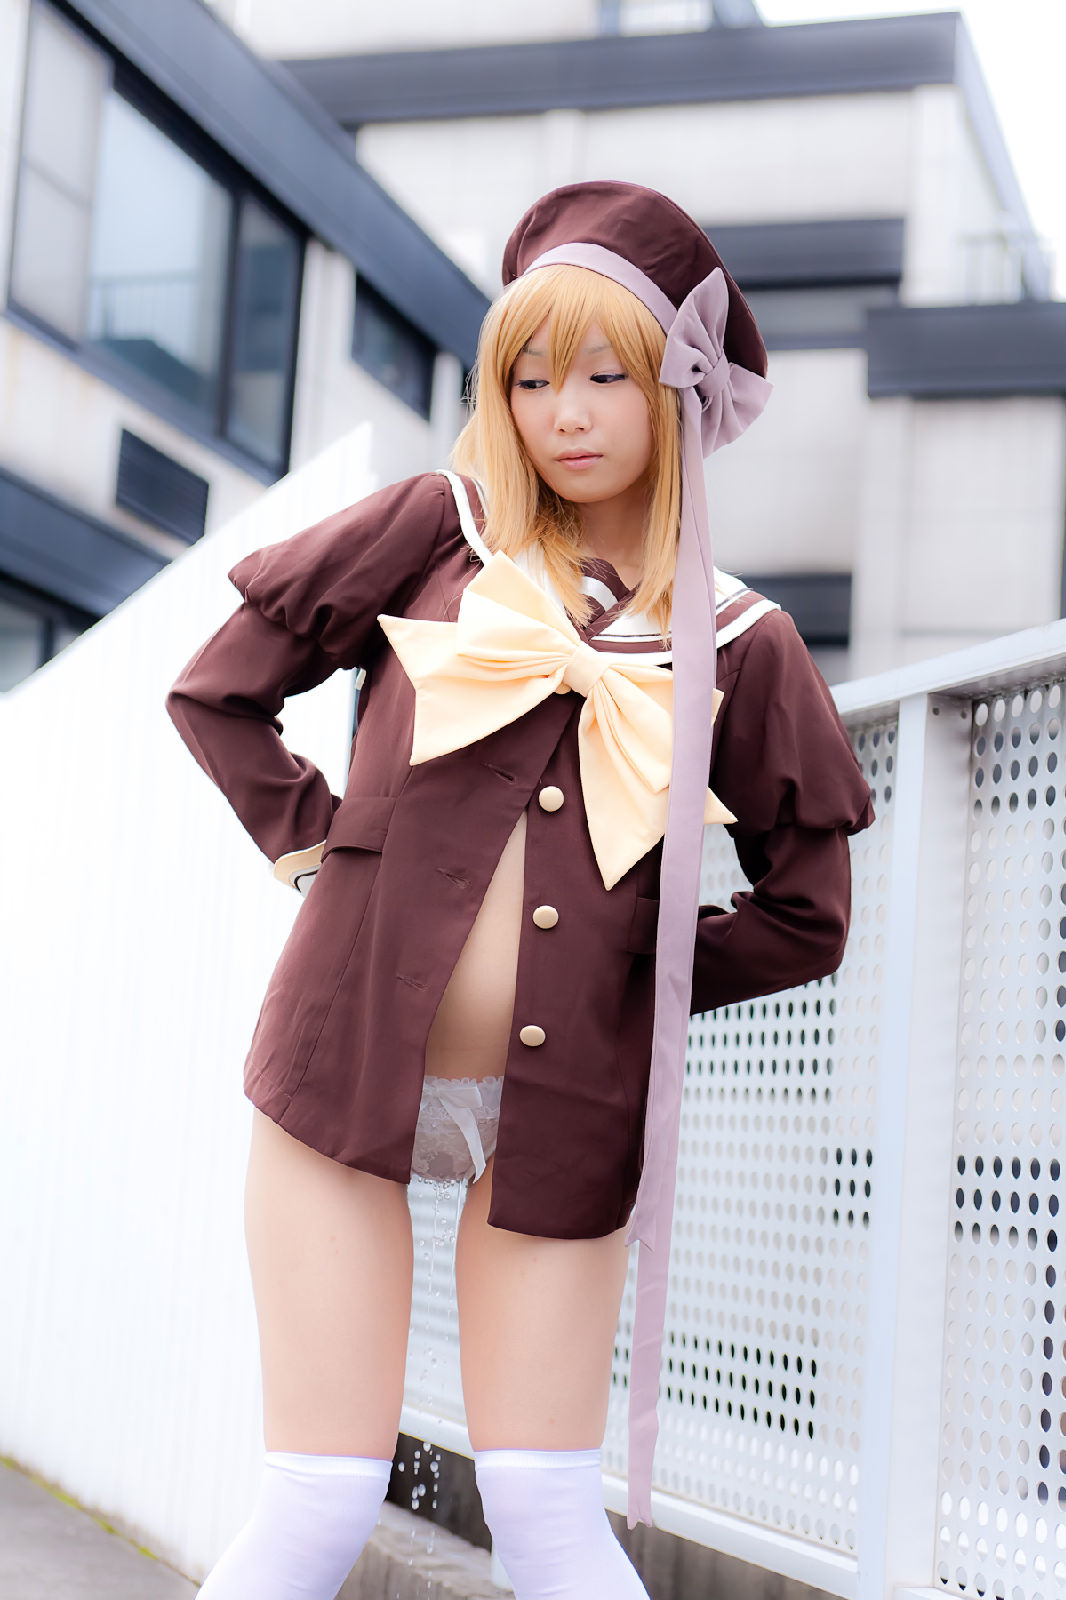 【c79】【福利】无下限cosplay少女再临